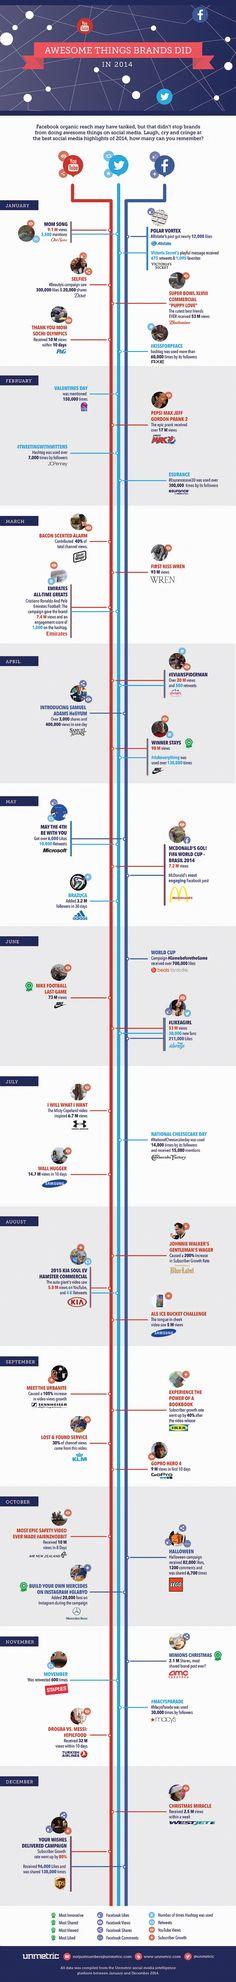 A 2014 Timeline of When Brands Did Superb Things in Social Media   Adweek